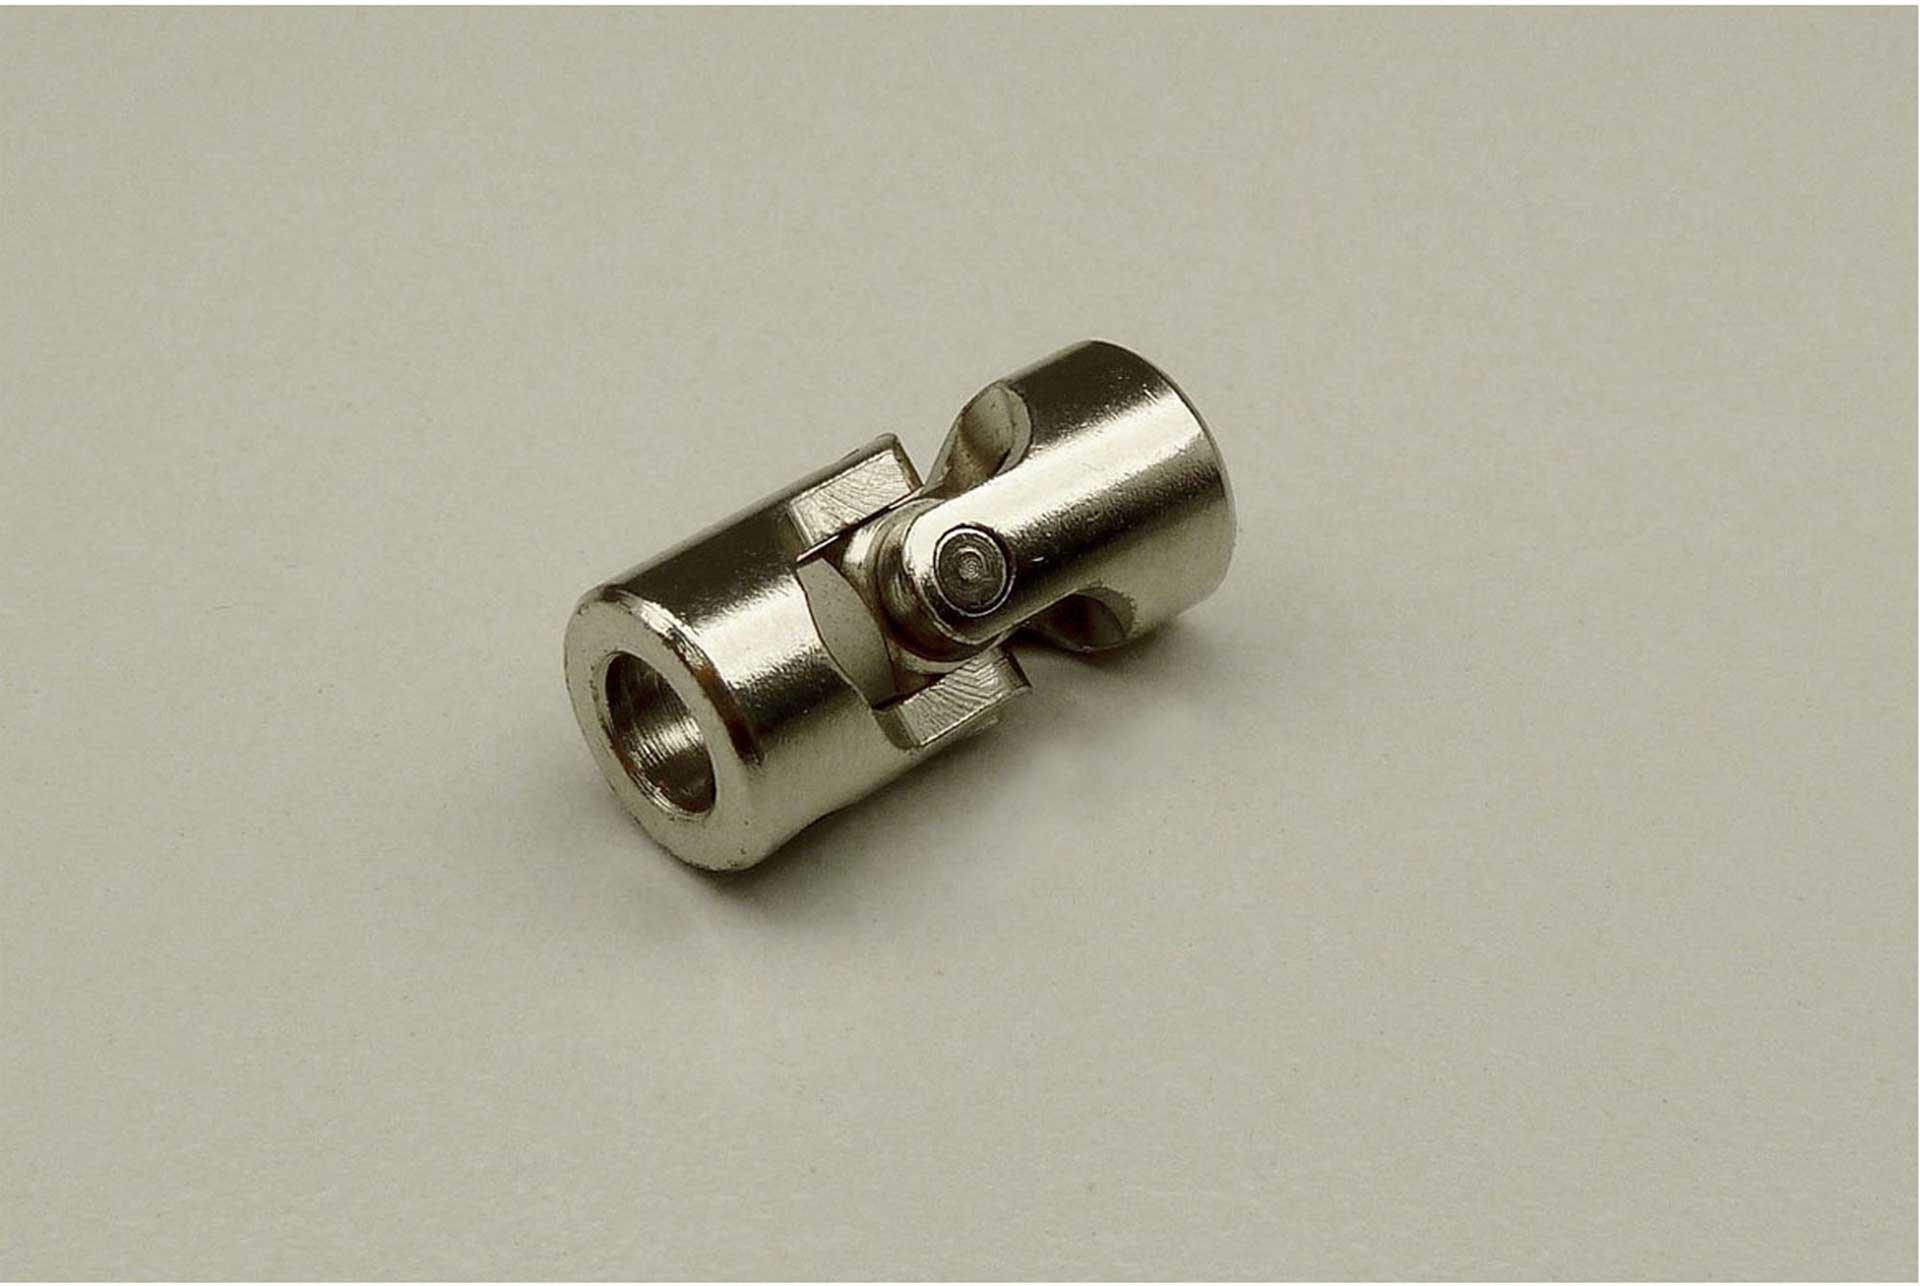 Robbe Modellsport RO-NAVY Gelenkkupplung Stahl D6xL6mm 1Stk.